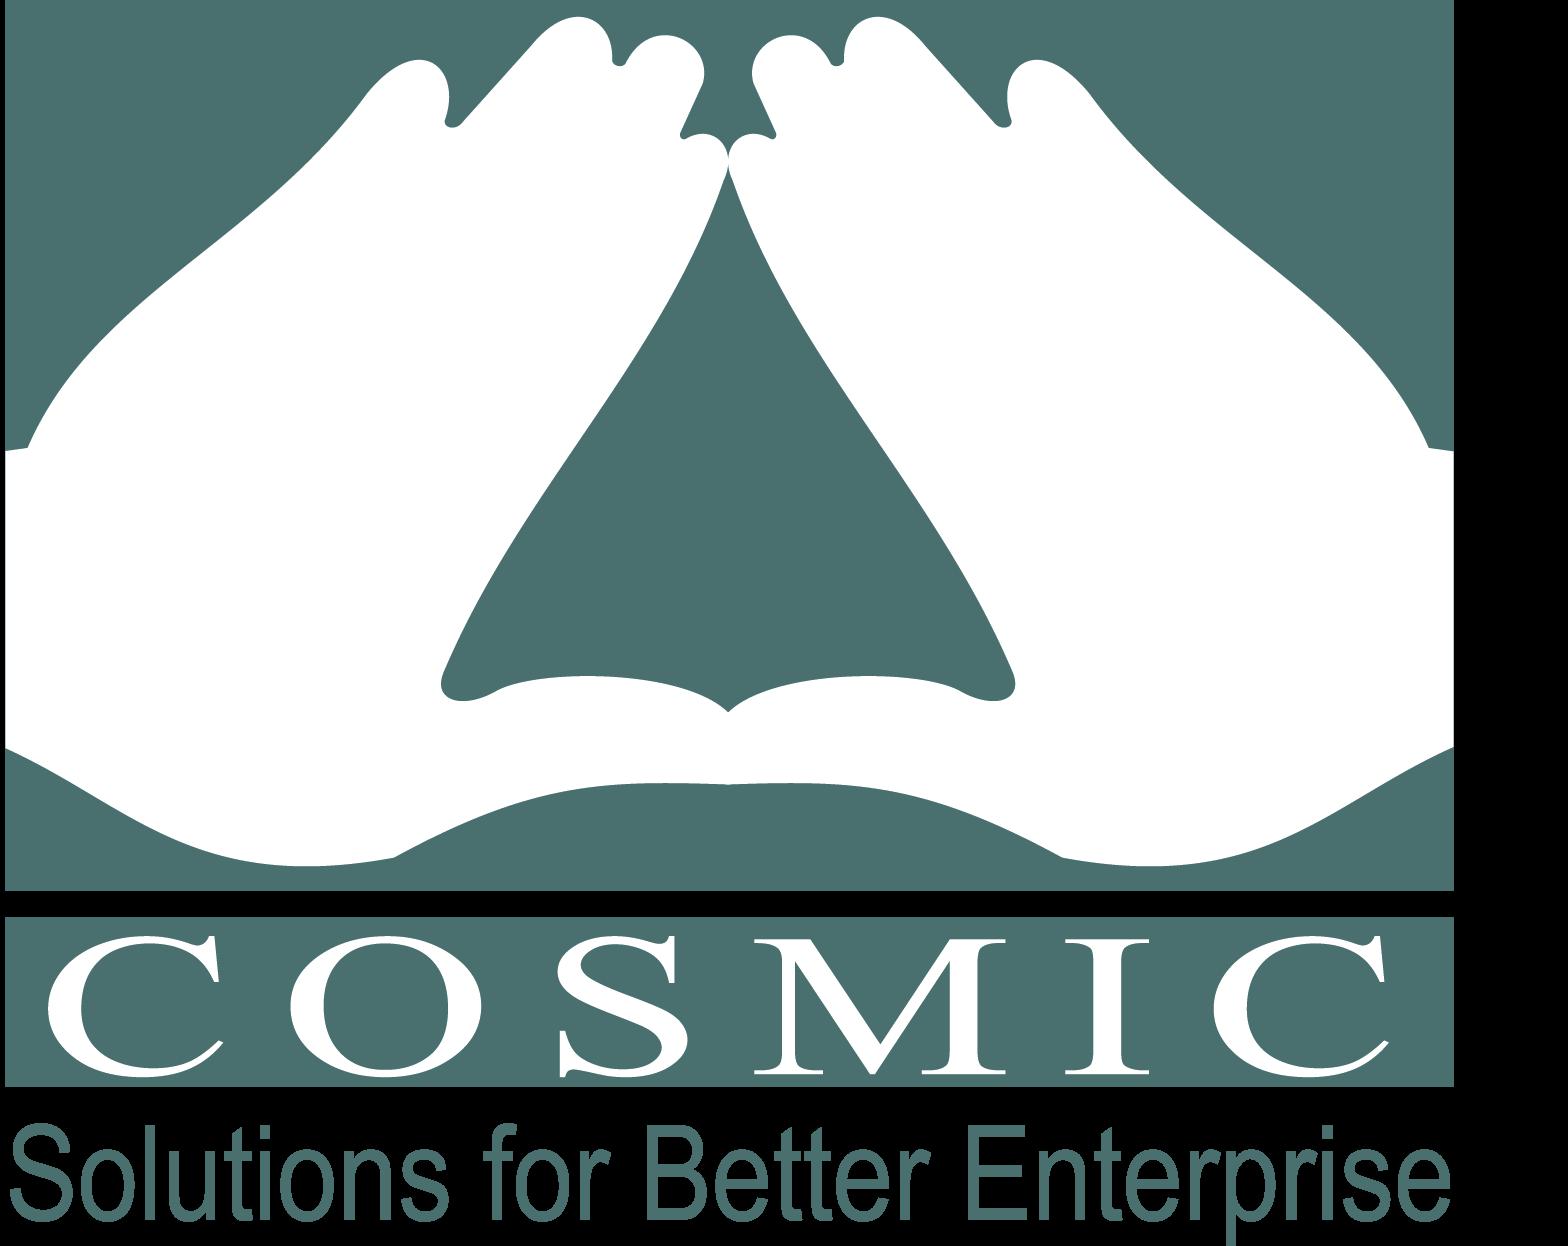 Cosmic Management Services